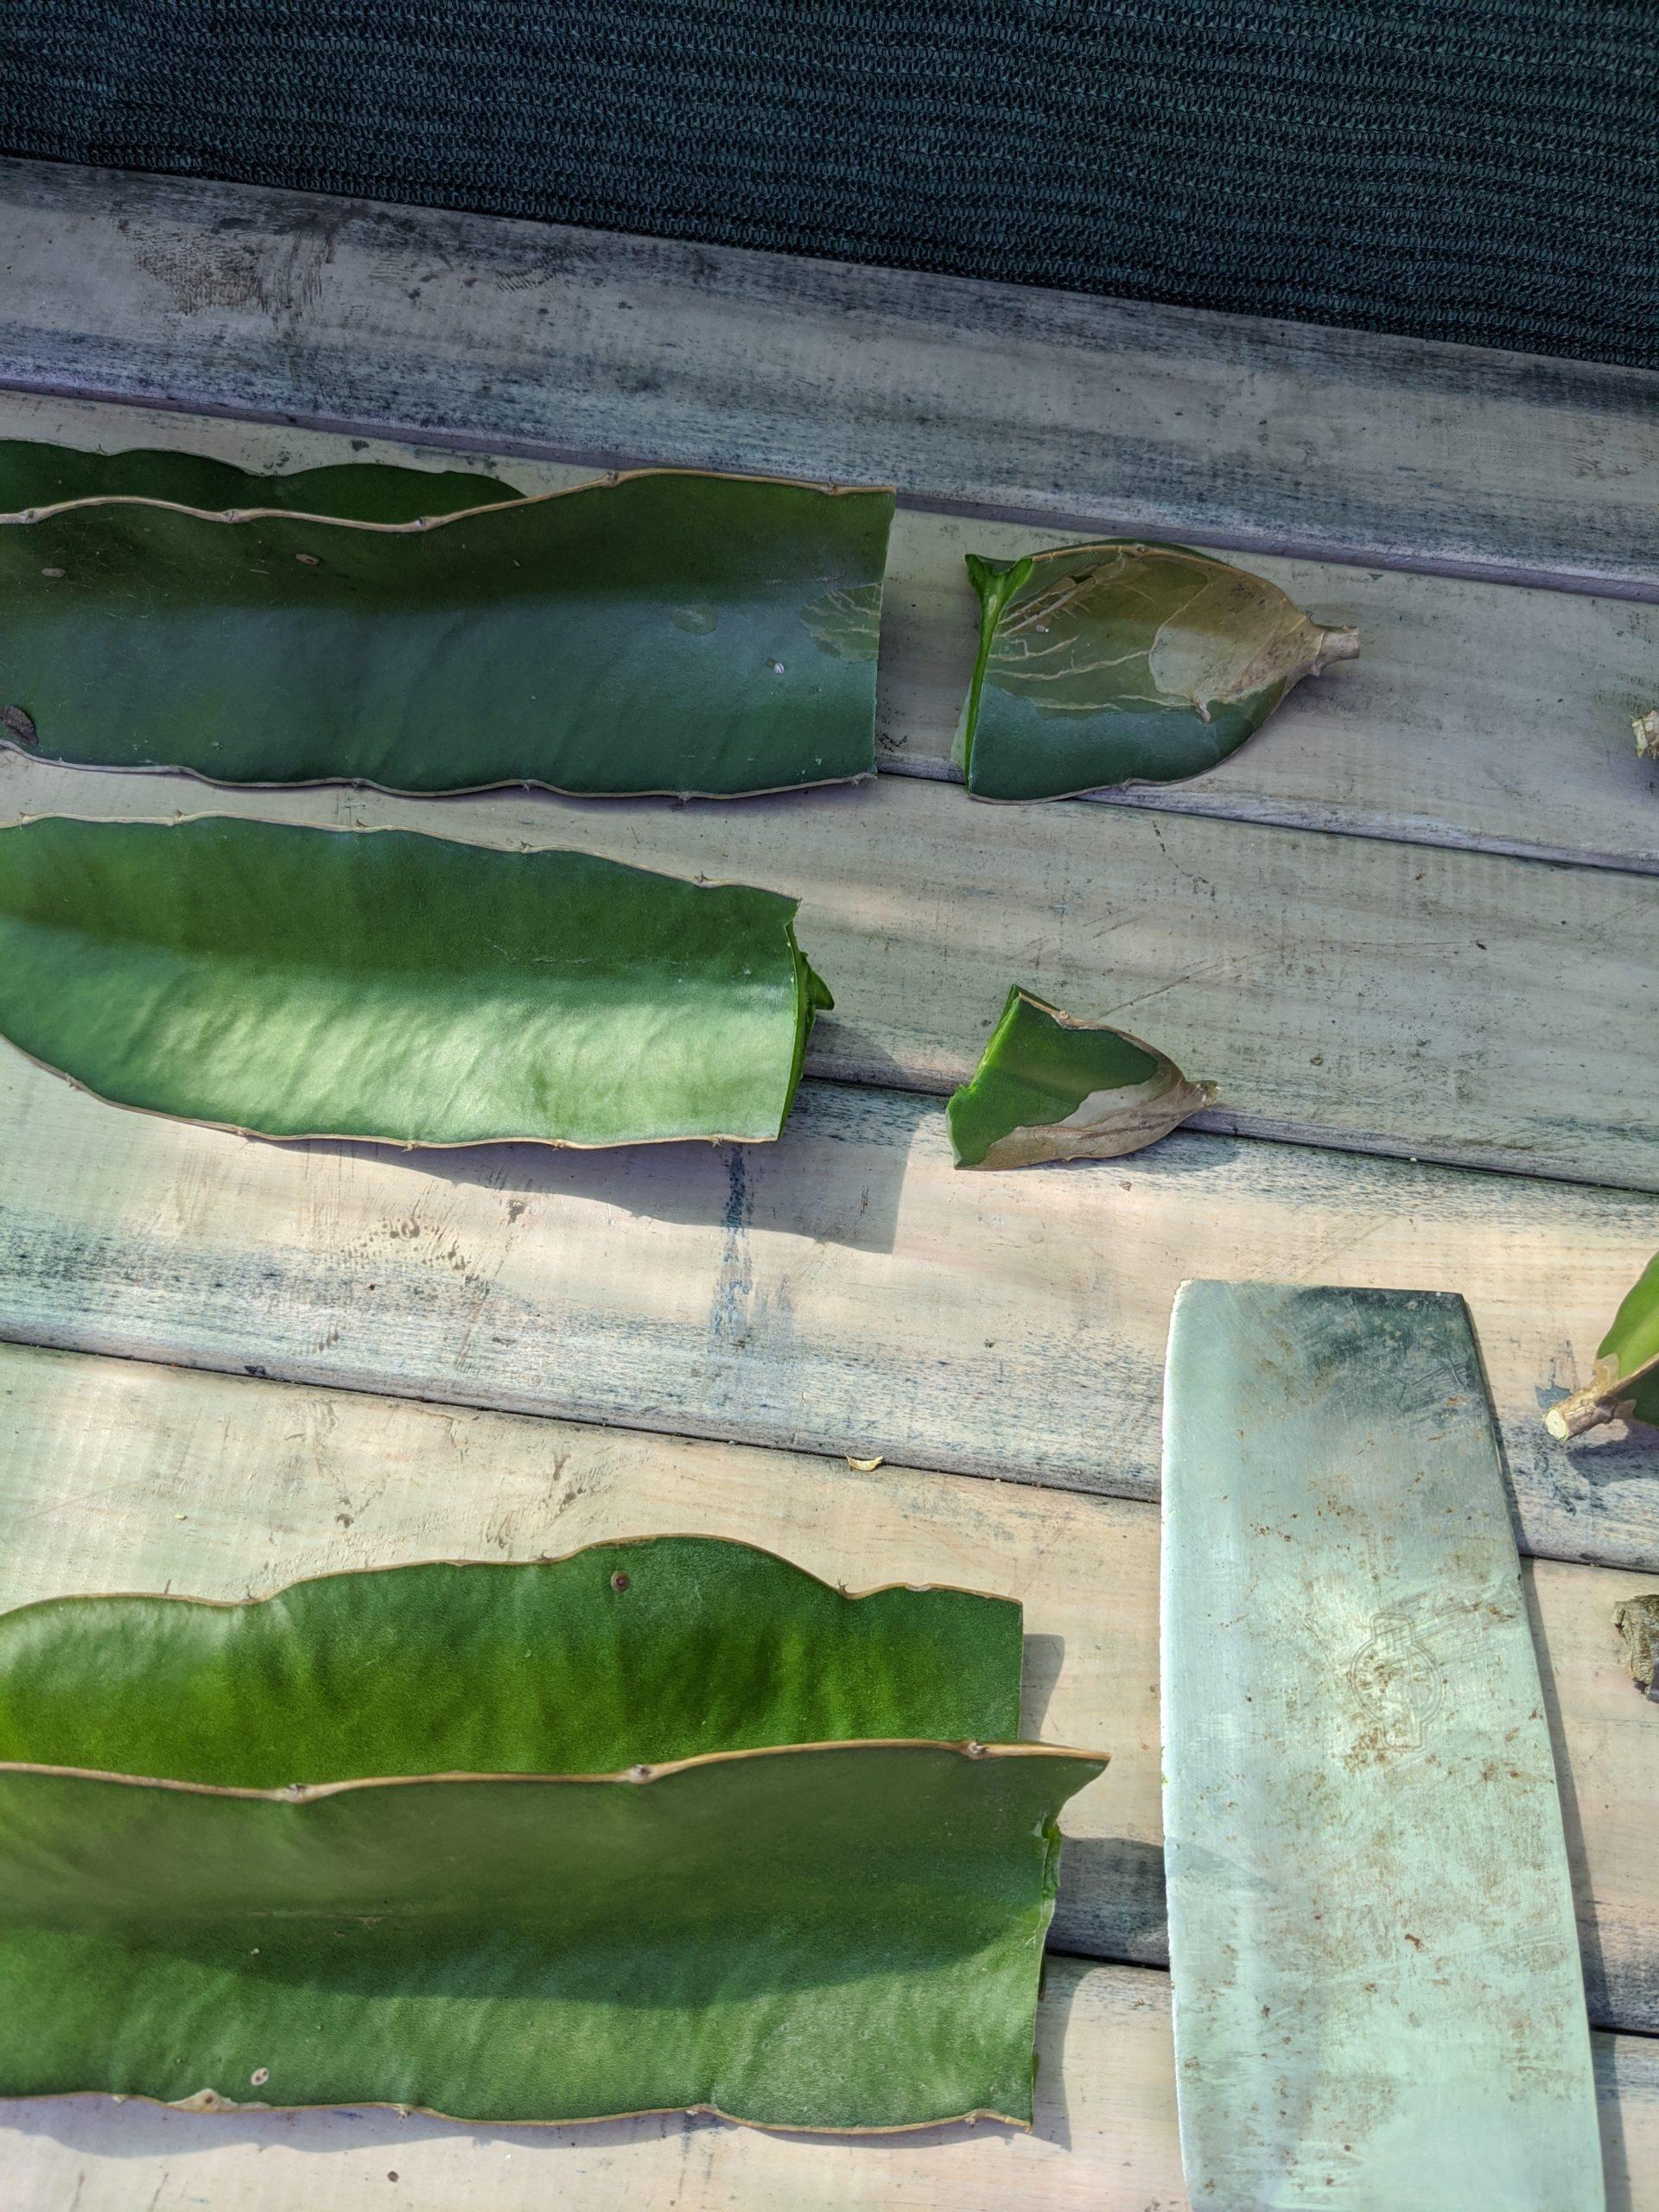 Shortened cuttings